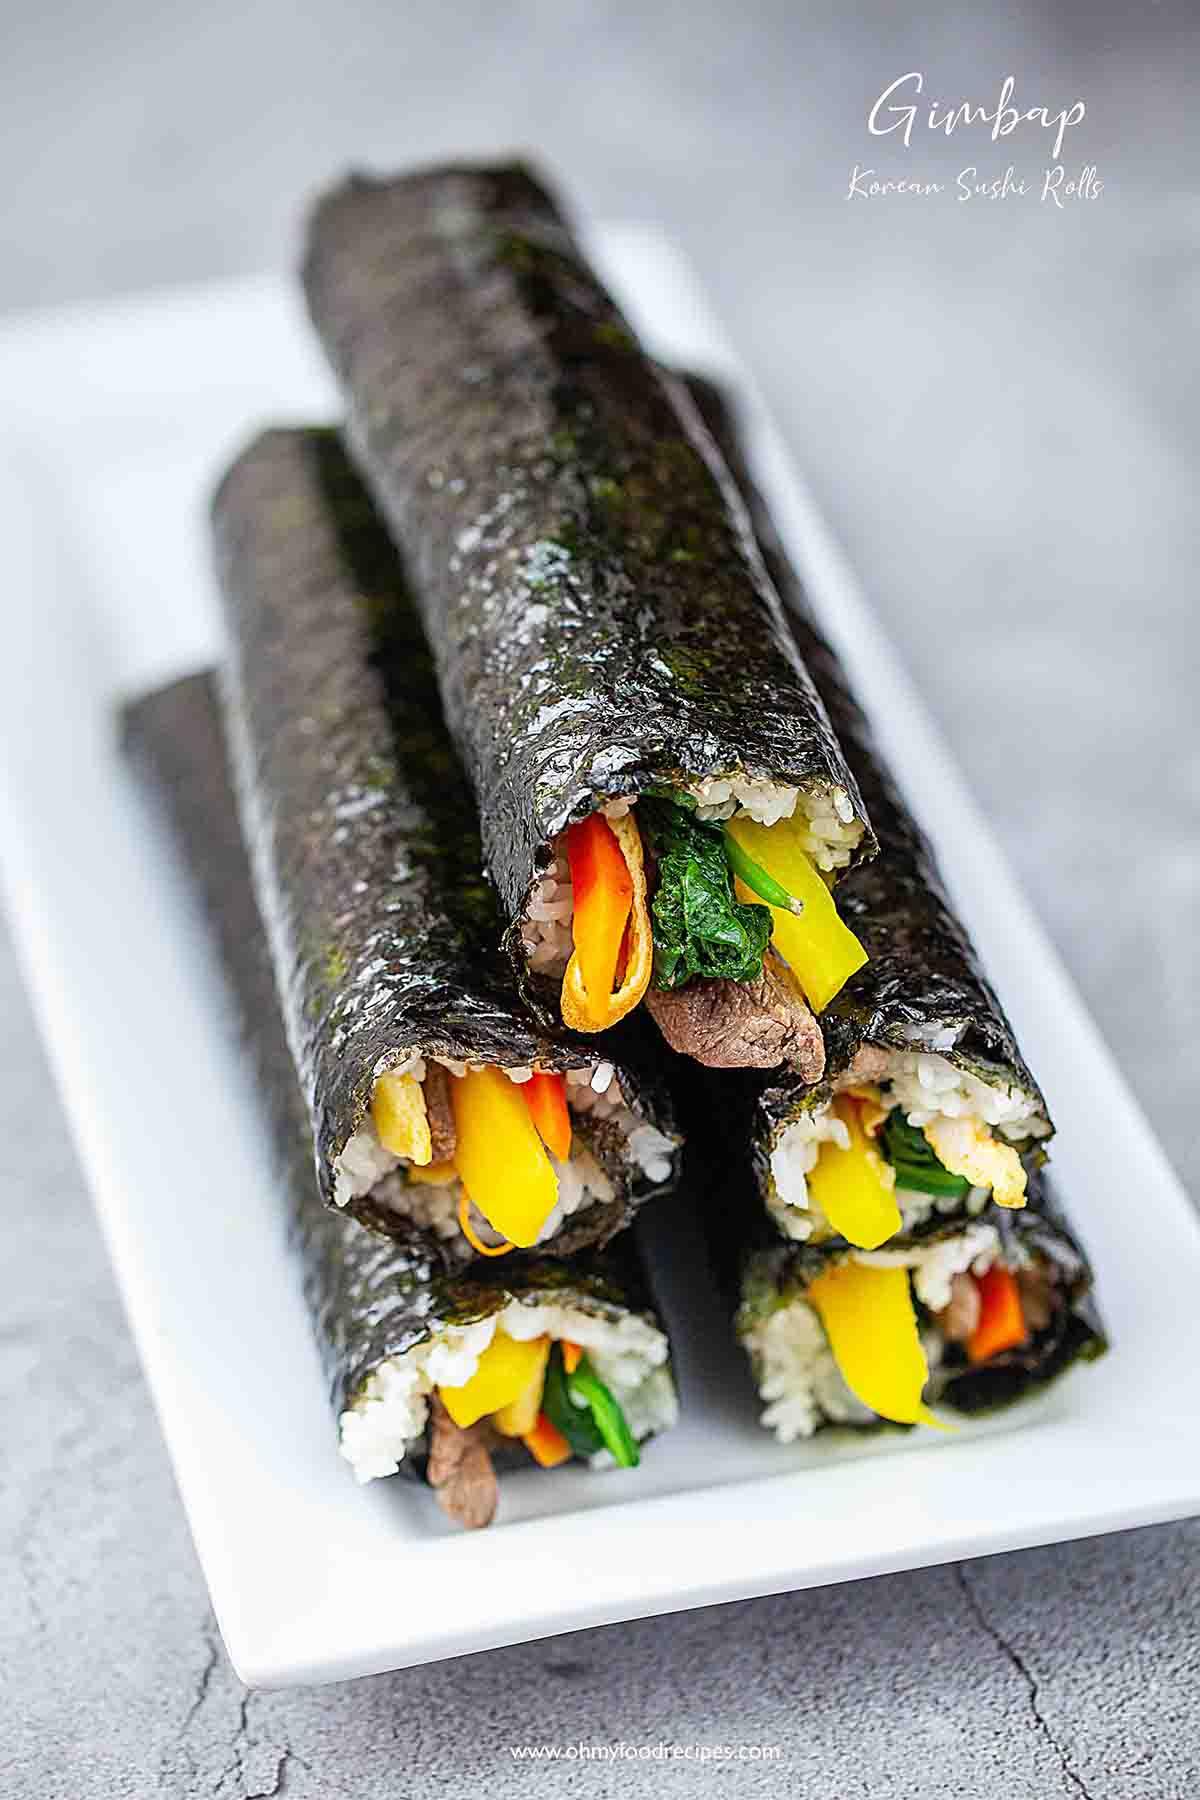 gimbap or kimbap Korean sushi rolls stack up on the plate